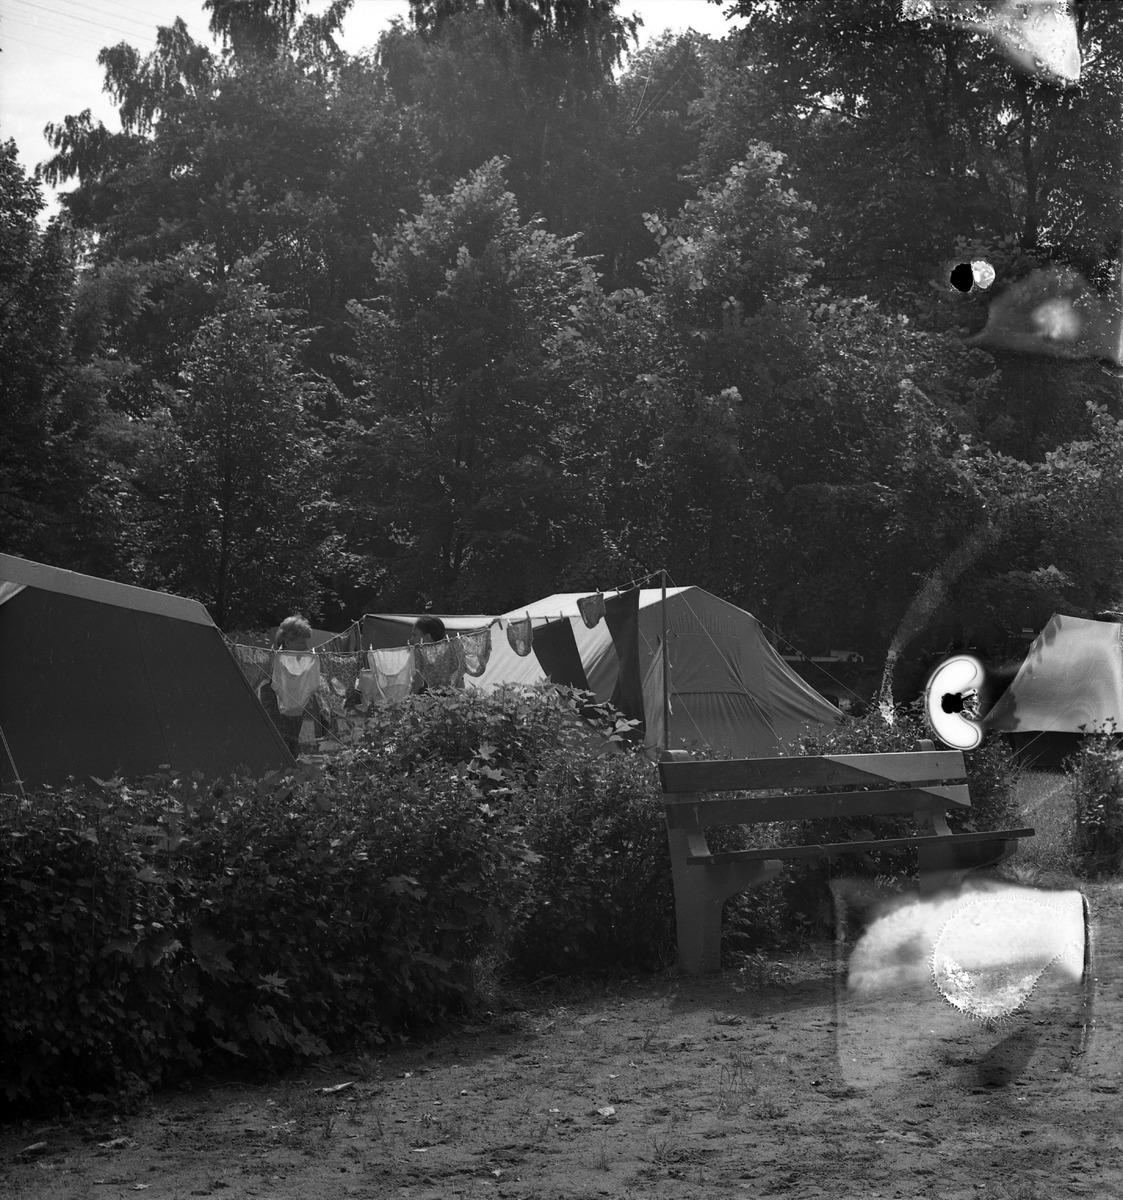 Camping przy zamku [4]